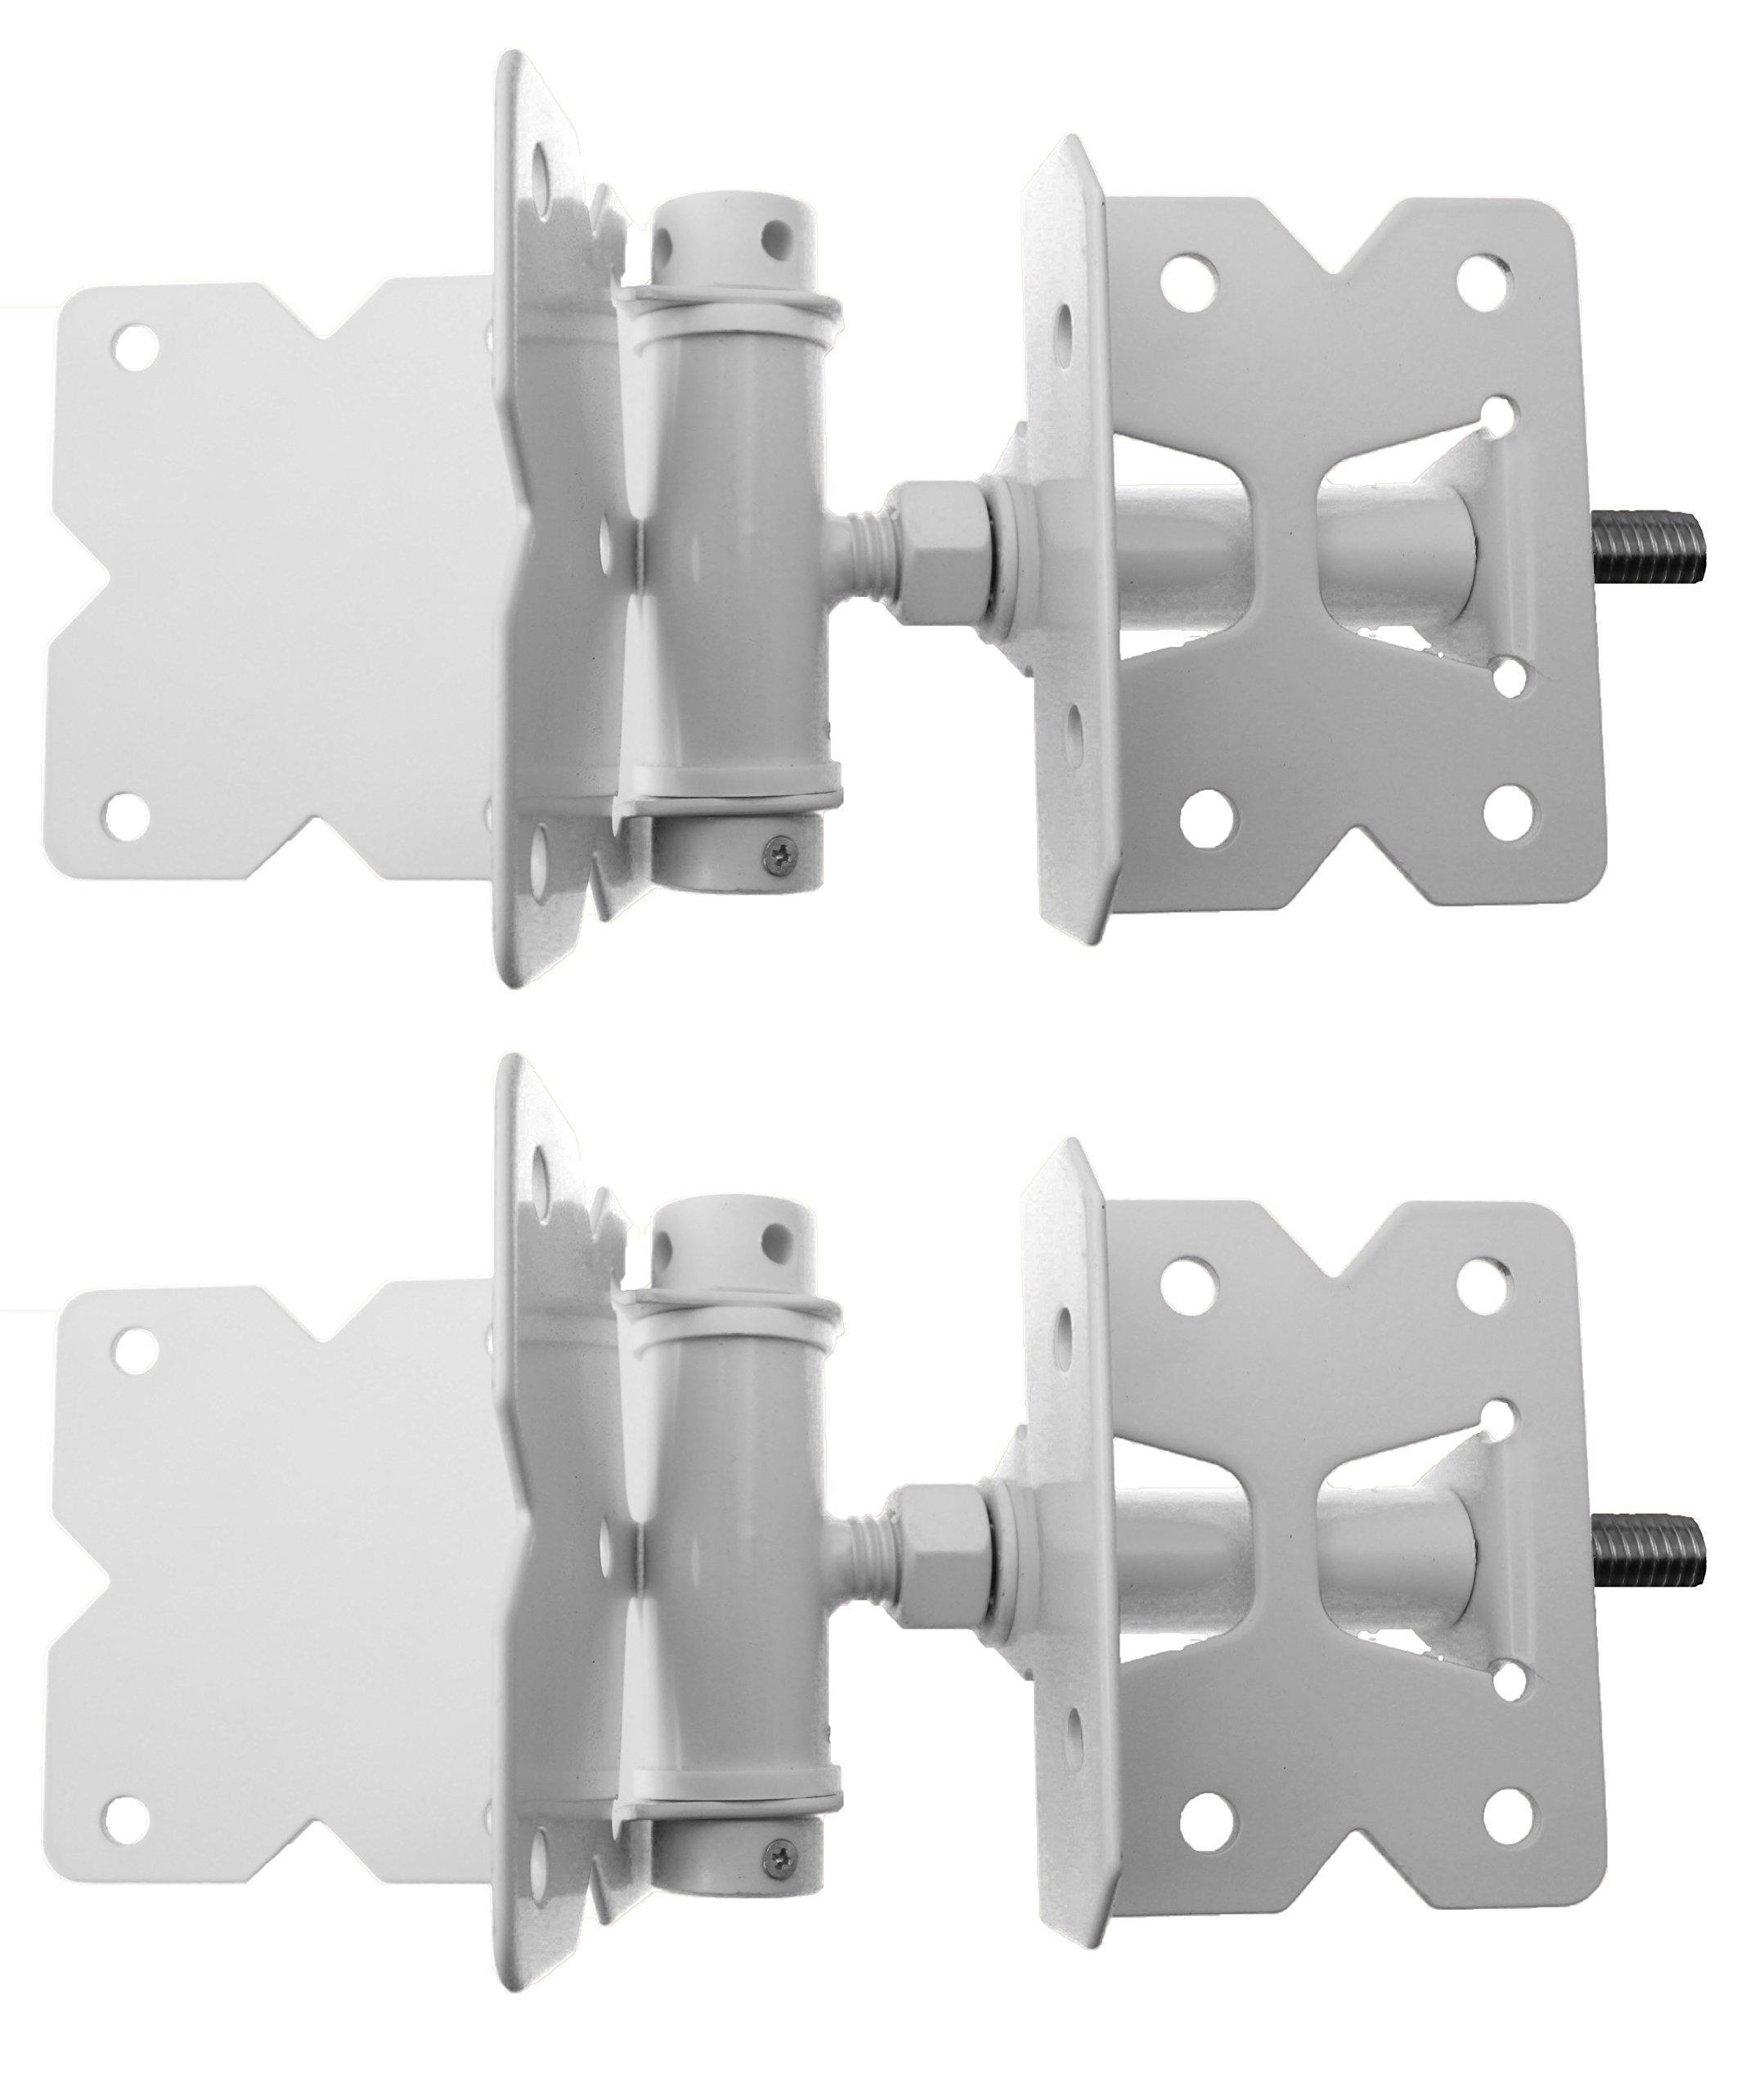 Heavy Duty Stainless Steel Powder Coated PVC/Vinyl Gate Hinge Set and Screws-WHITE